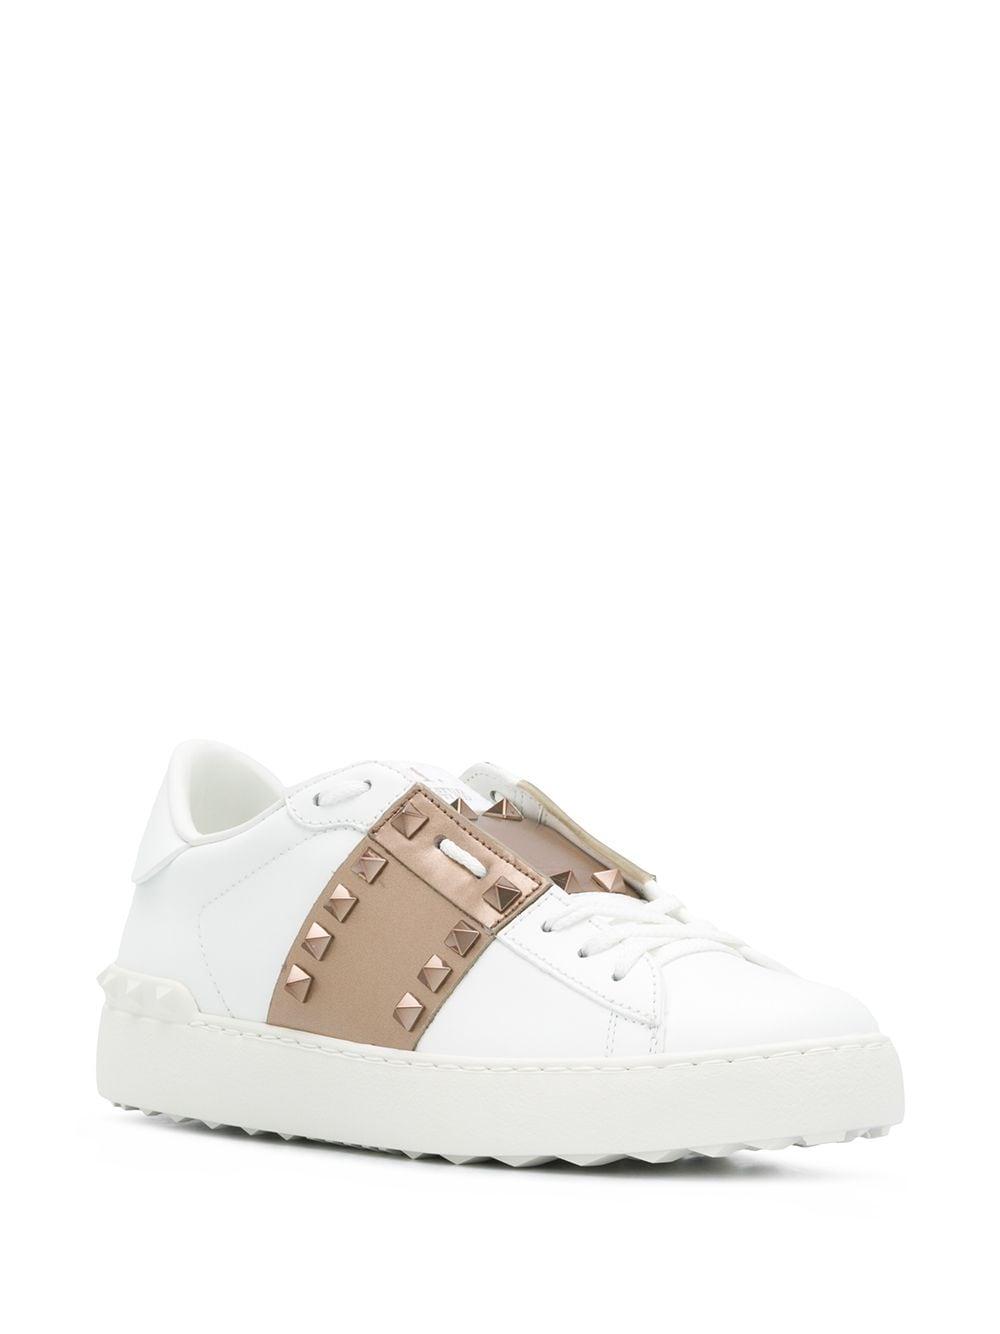 Rockstud Untitled Leather Sneakers